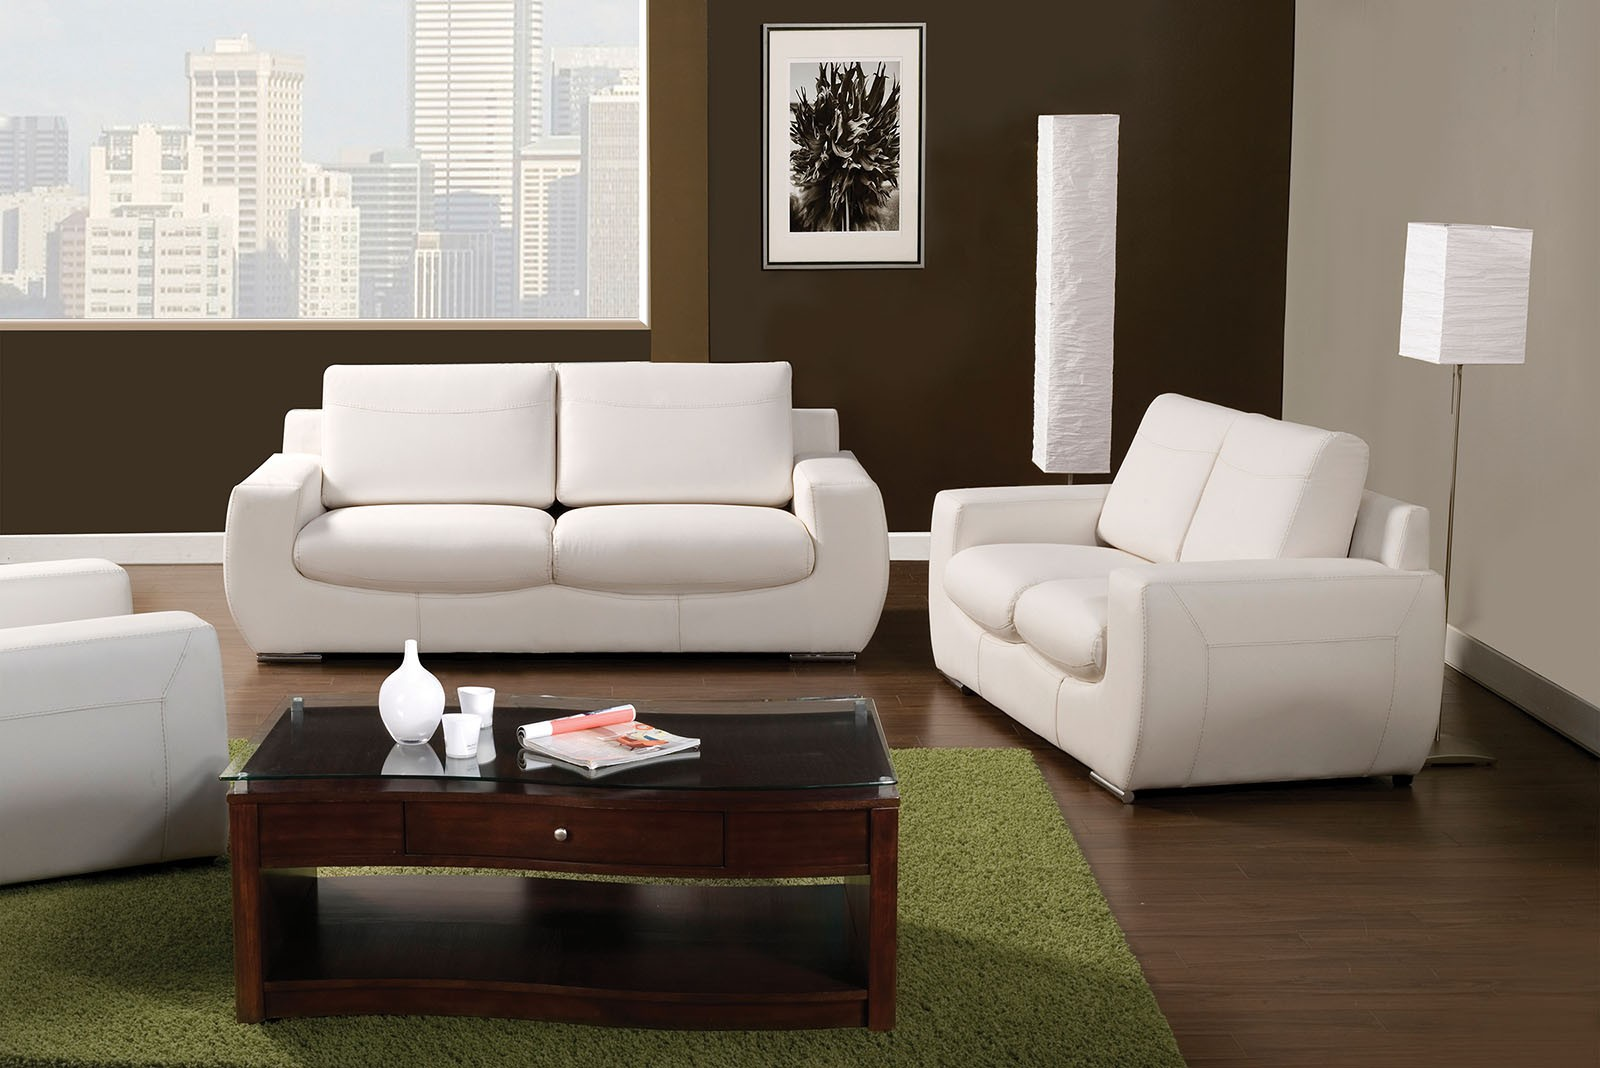 Tekir white living room set sm6032 sf furniture of america for White living room set